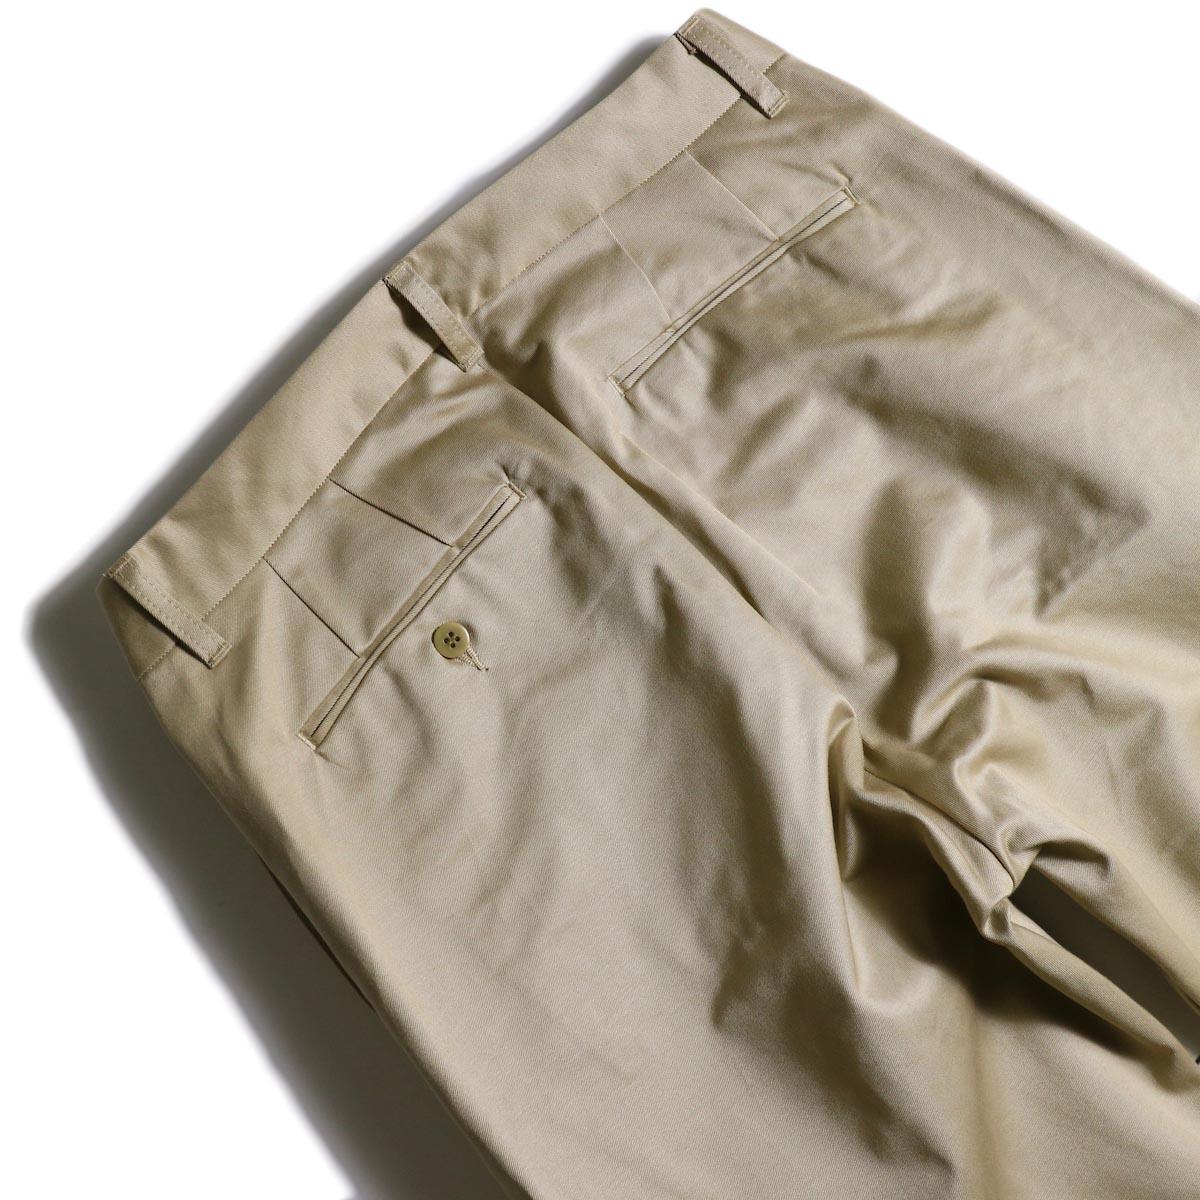 FUTURE PRIMITIVE / FP FZ CHINO PANTS (Beige)ヒップポケット